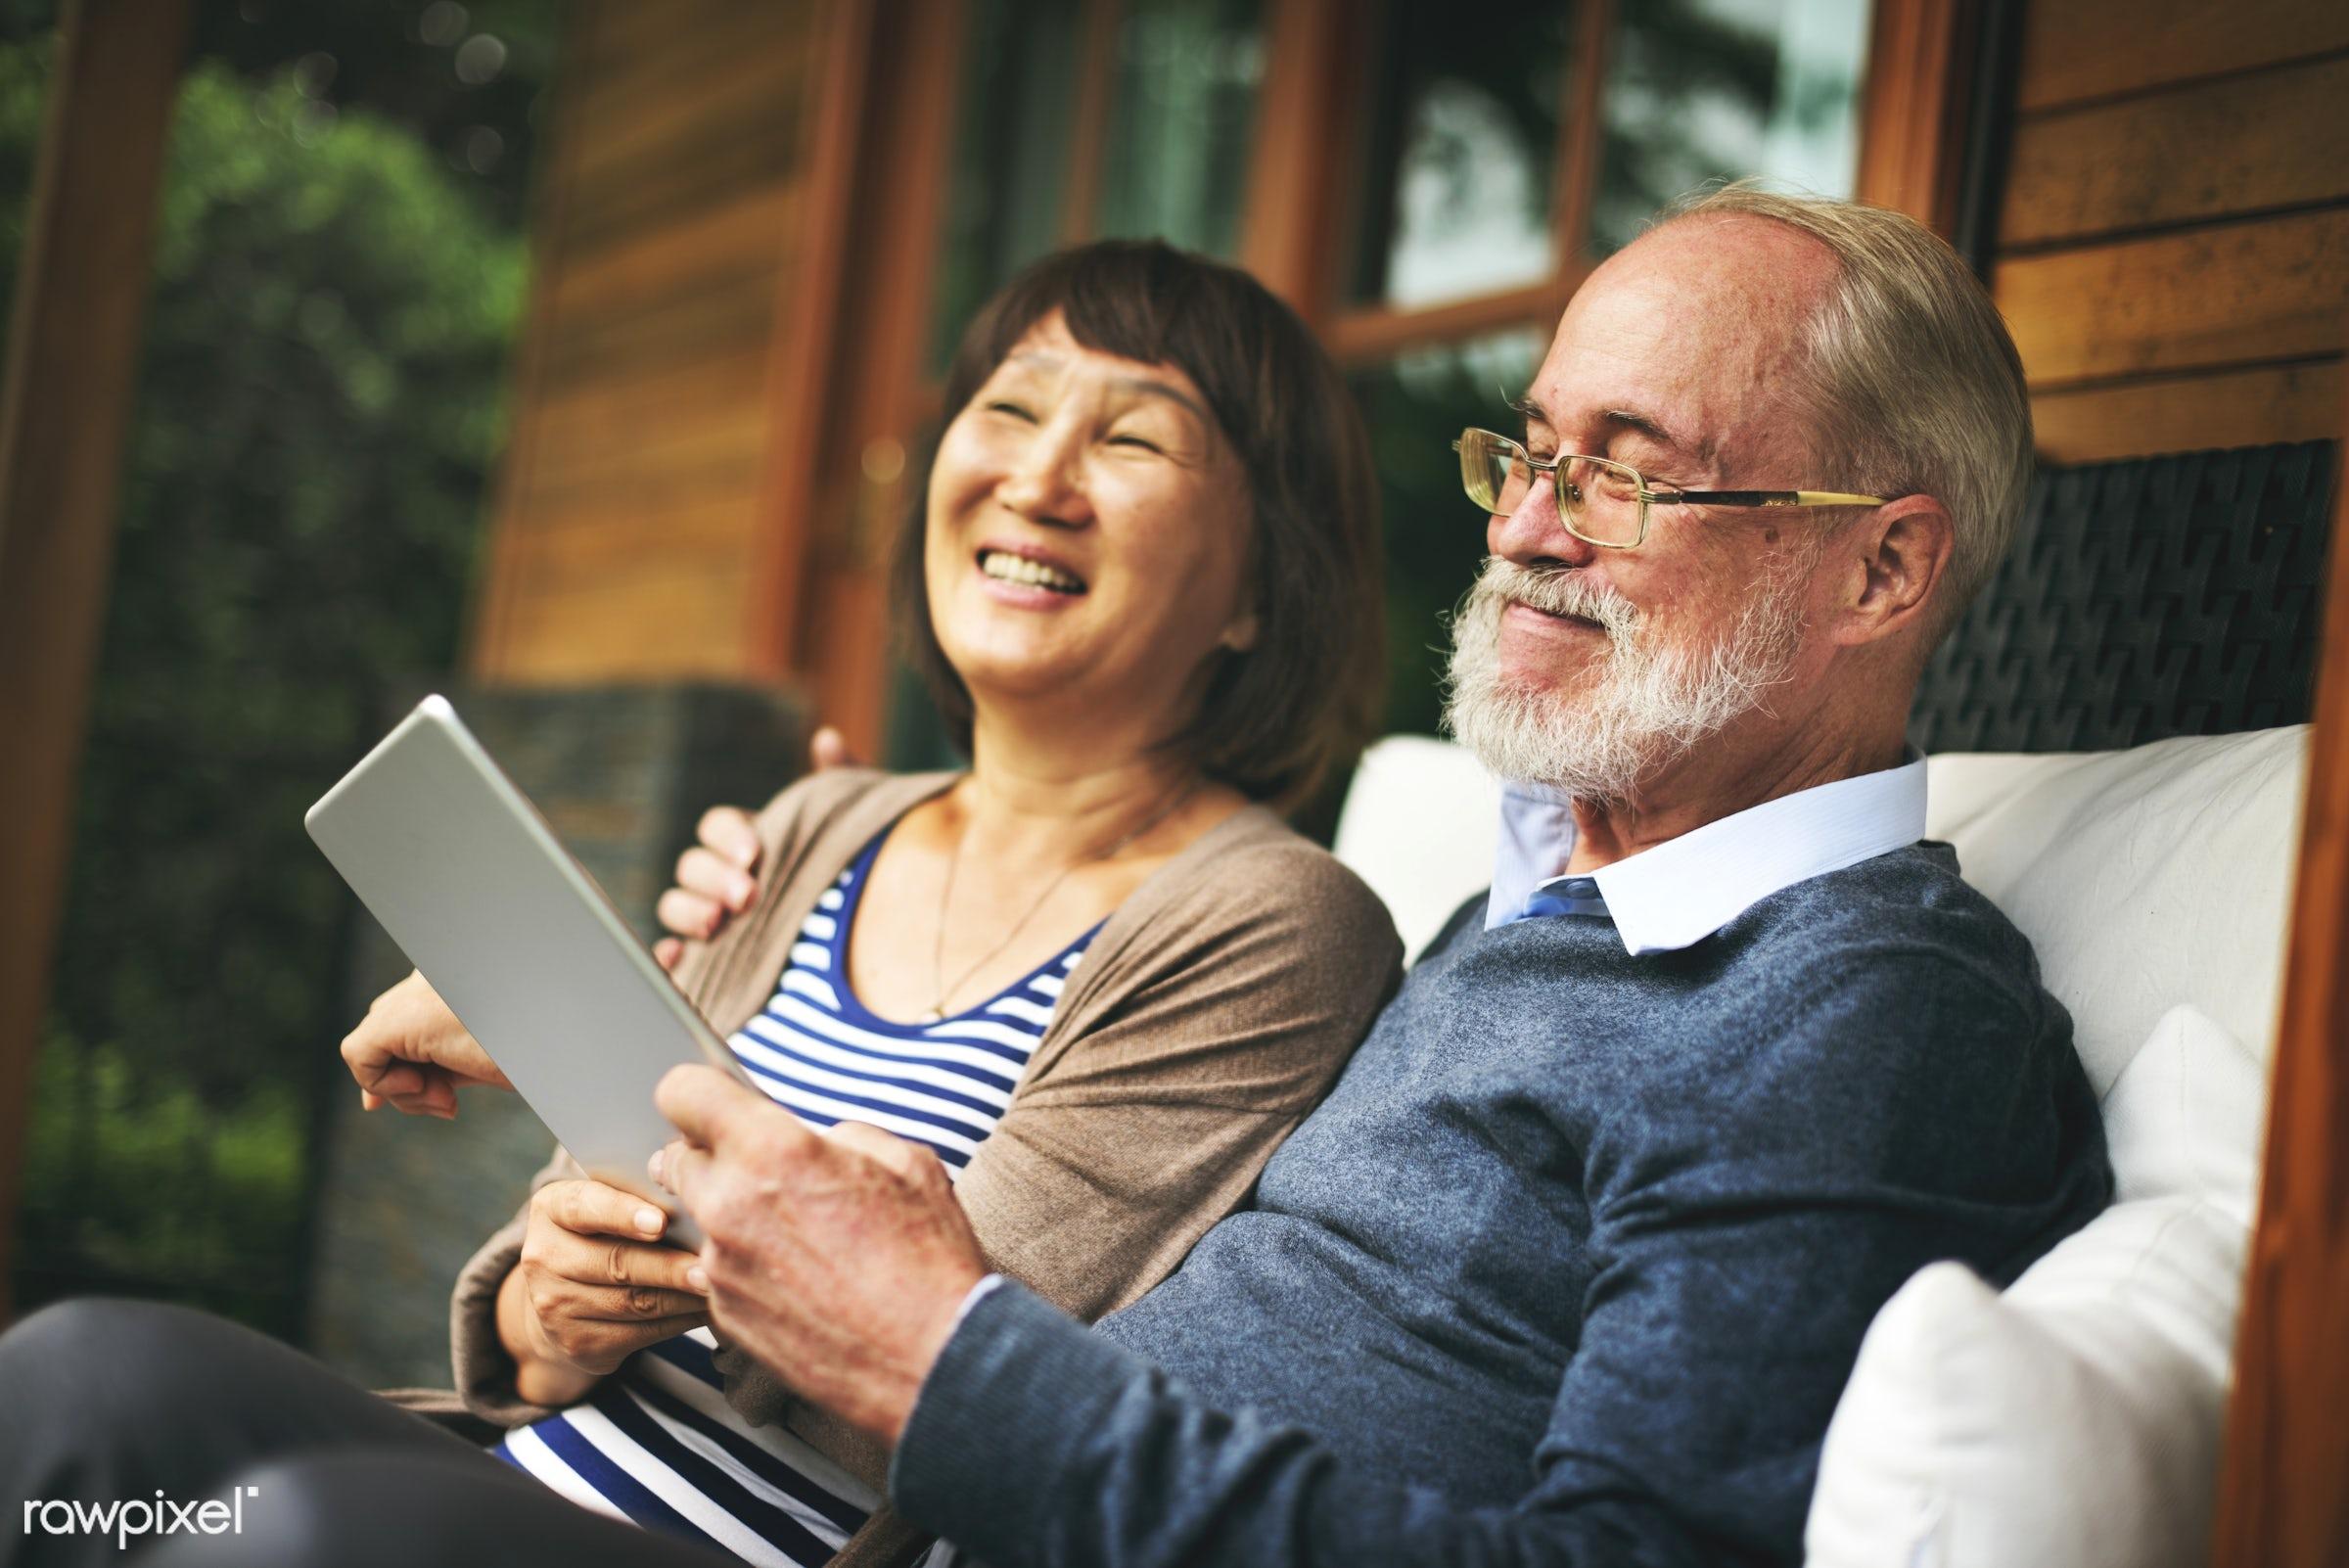 dating, adult, asian ethnicity, bonding, caucasian, chair, cheerful, couple, device, digital, door, female, garden,...